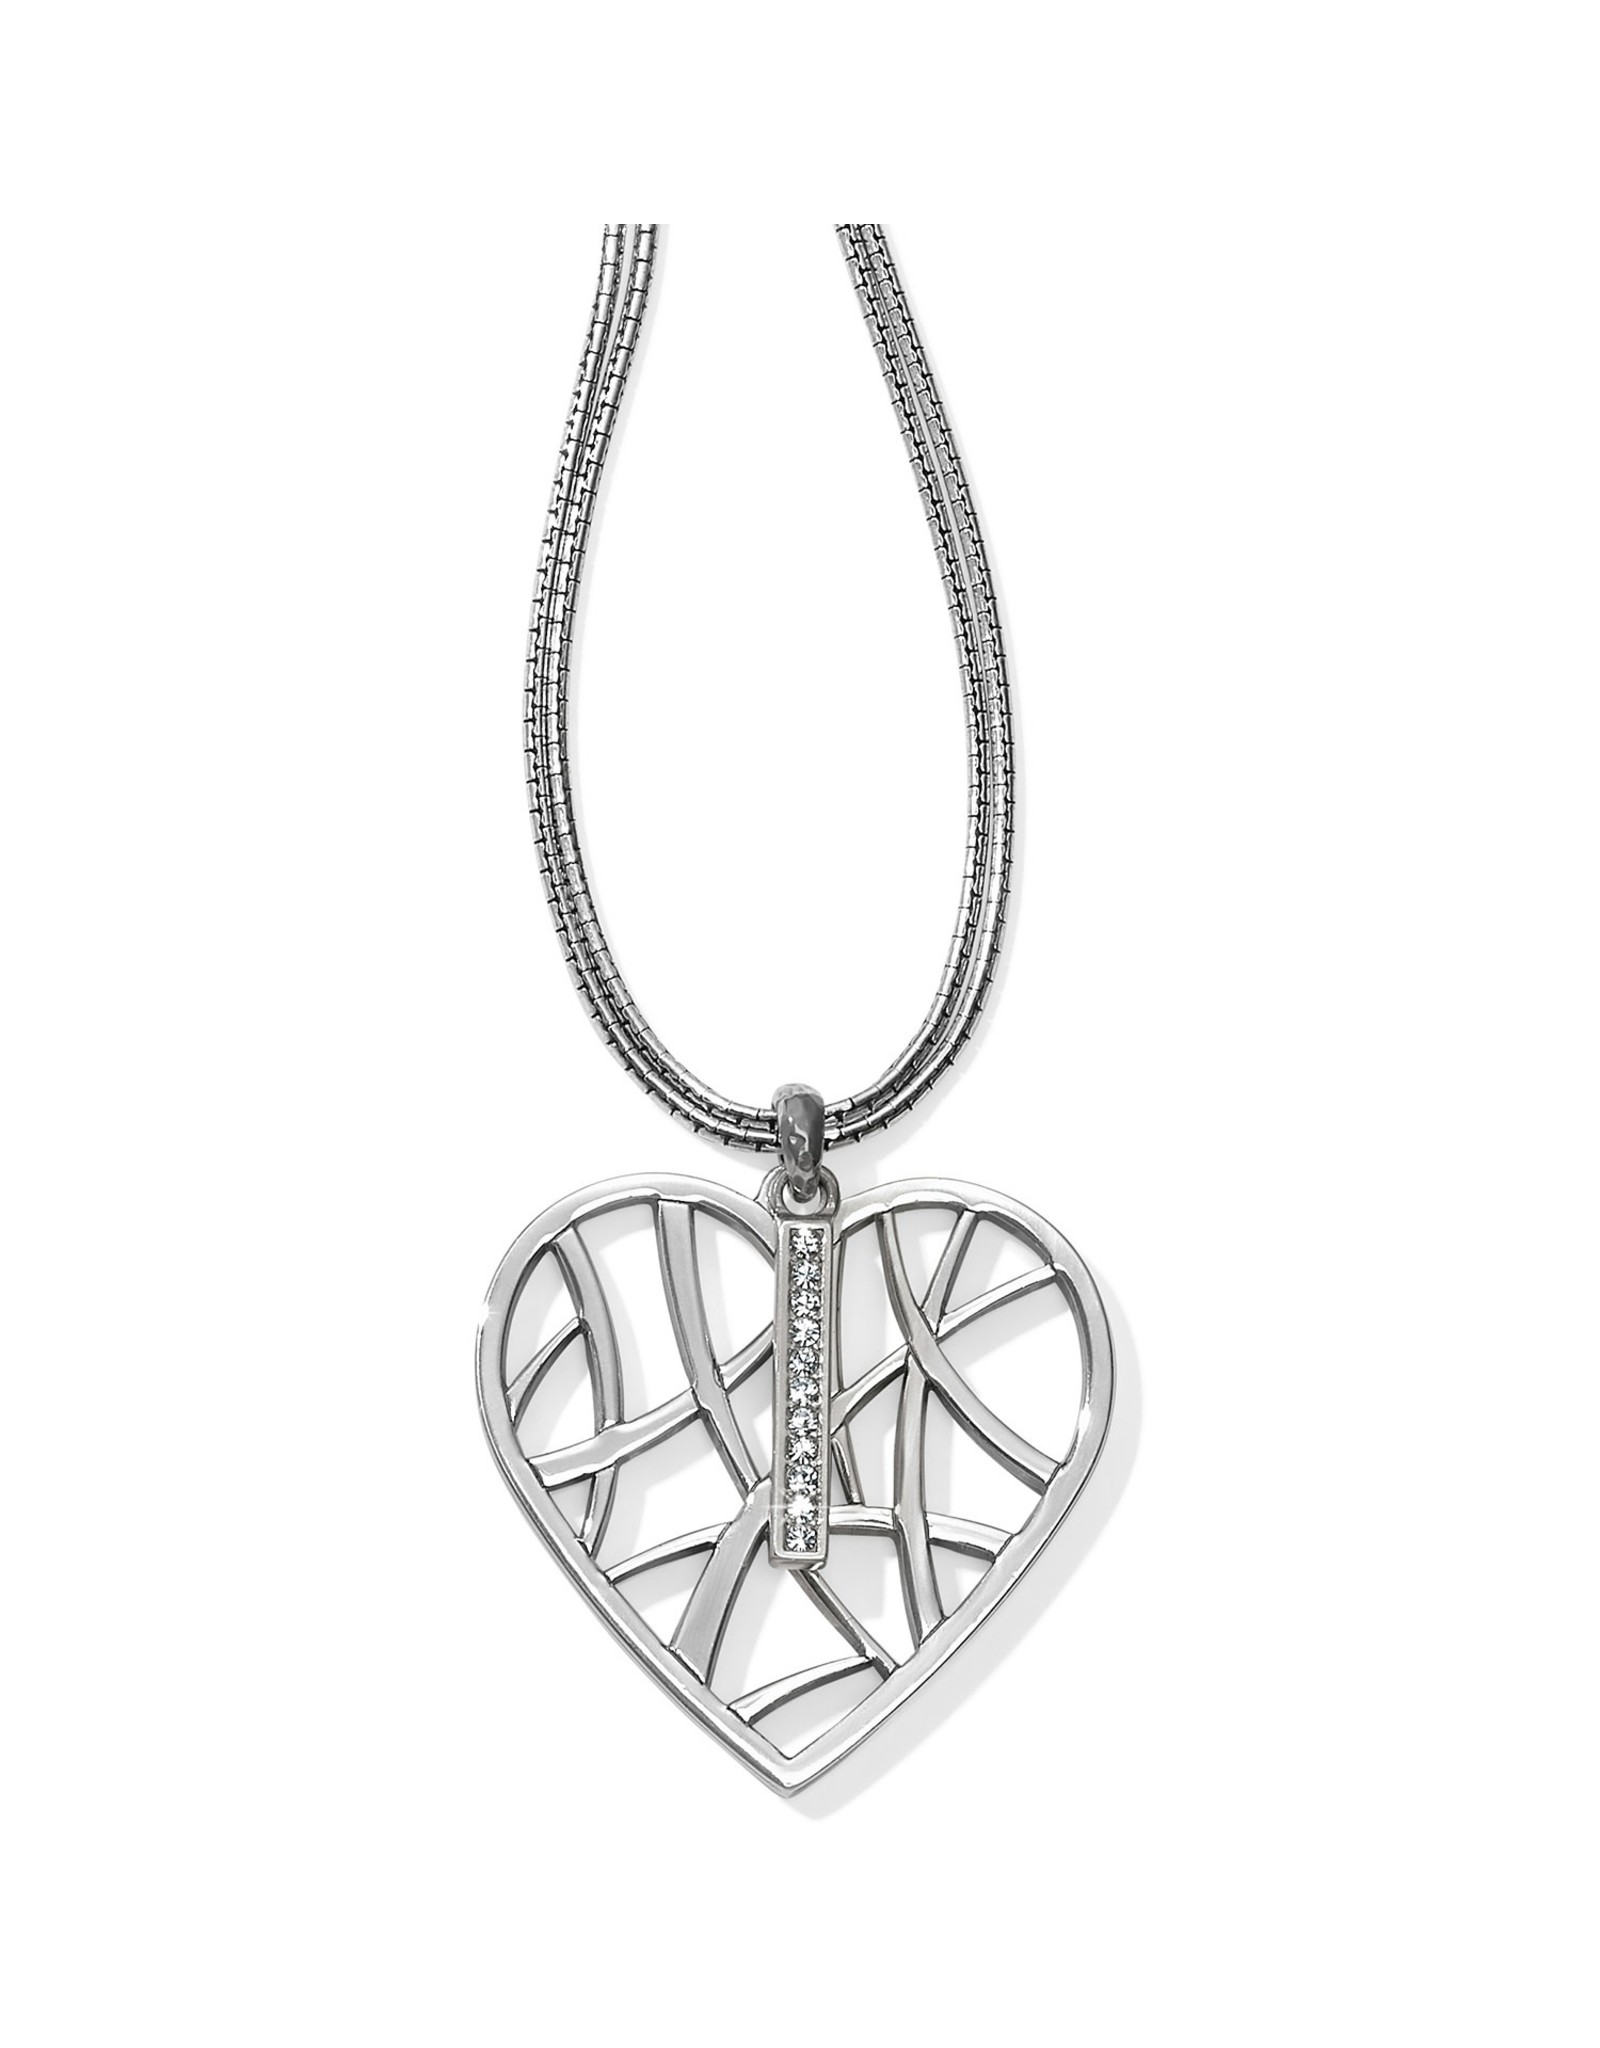 Brighton Meridian Zenith Convertible Heart Necklace